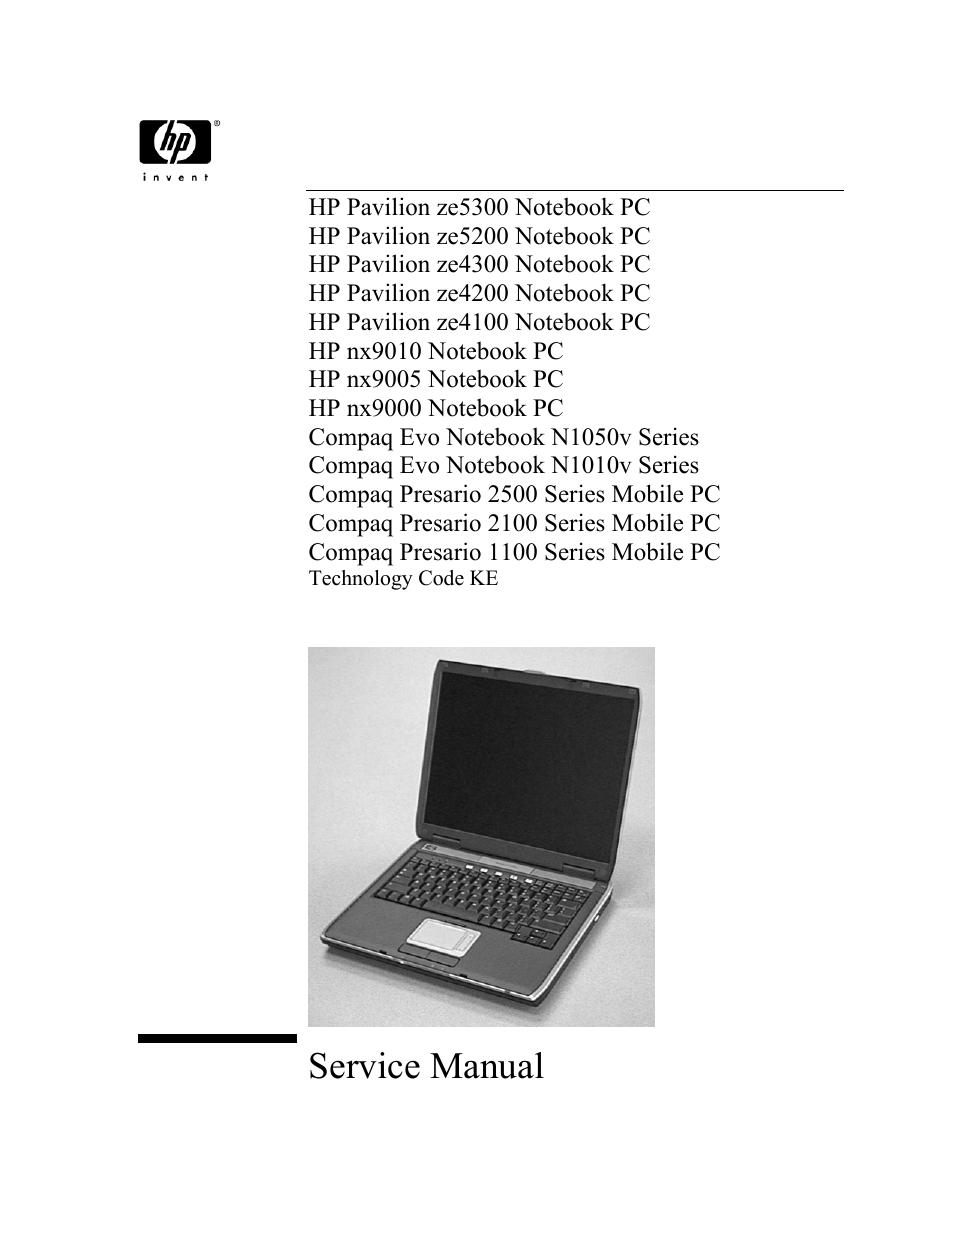 hp 2100 user manual product user guide instruction u2022 rh testdpc co